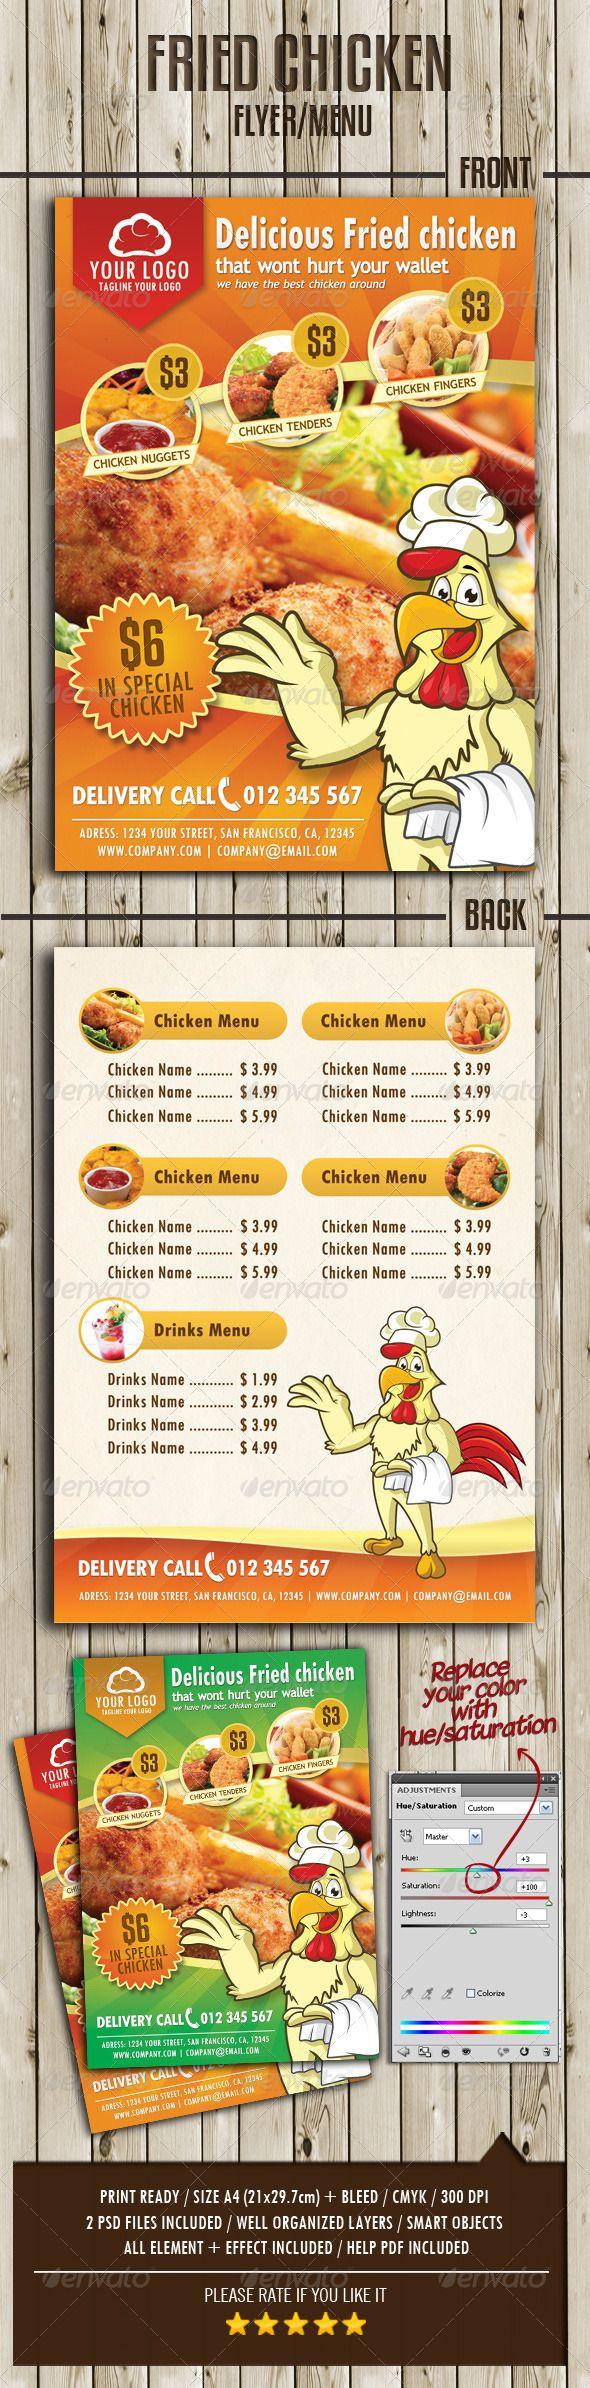 Fried Chicken Flyer Menu - Restaurant Flyers